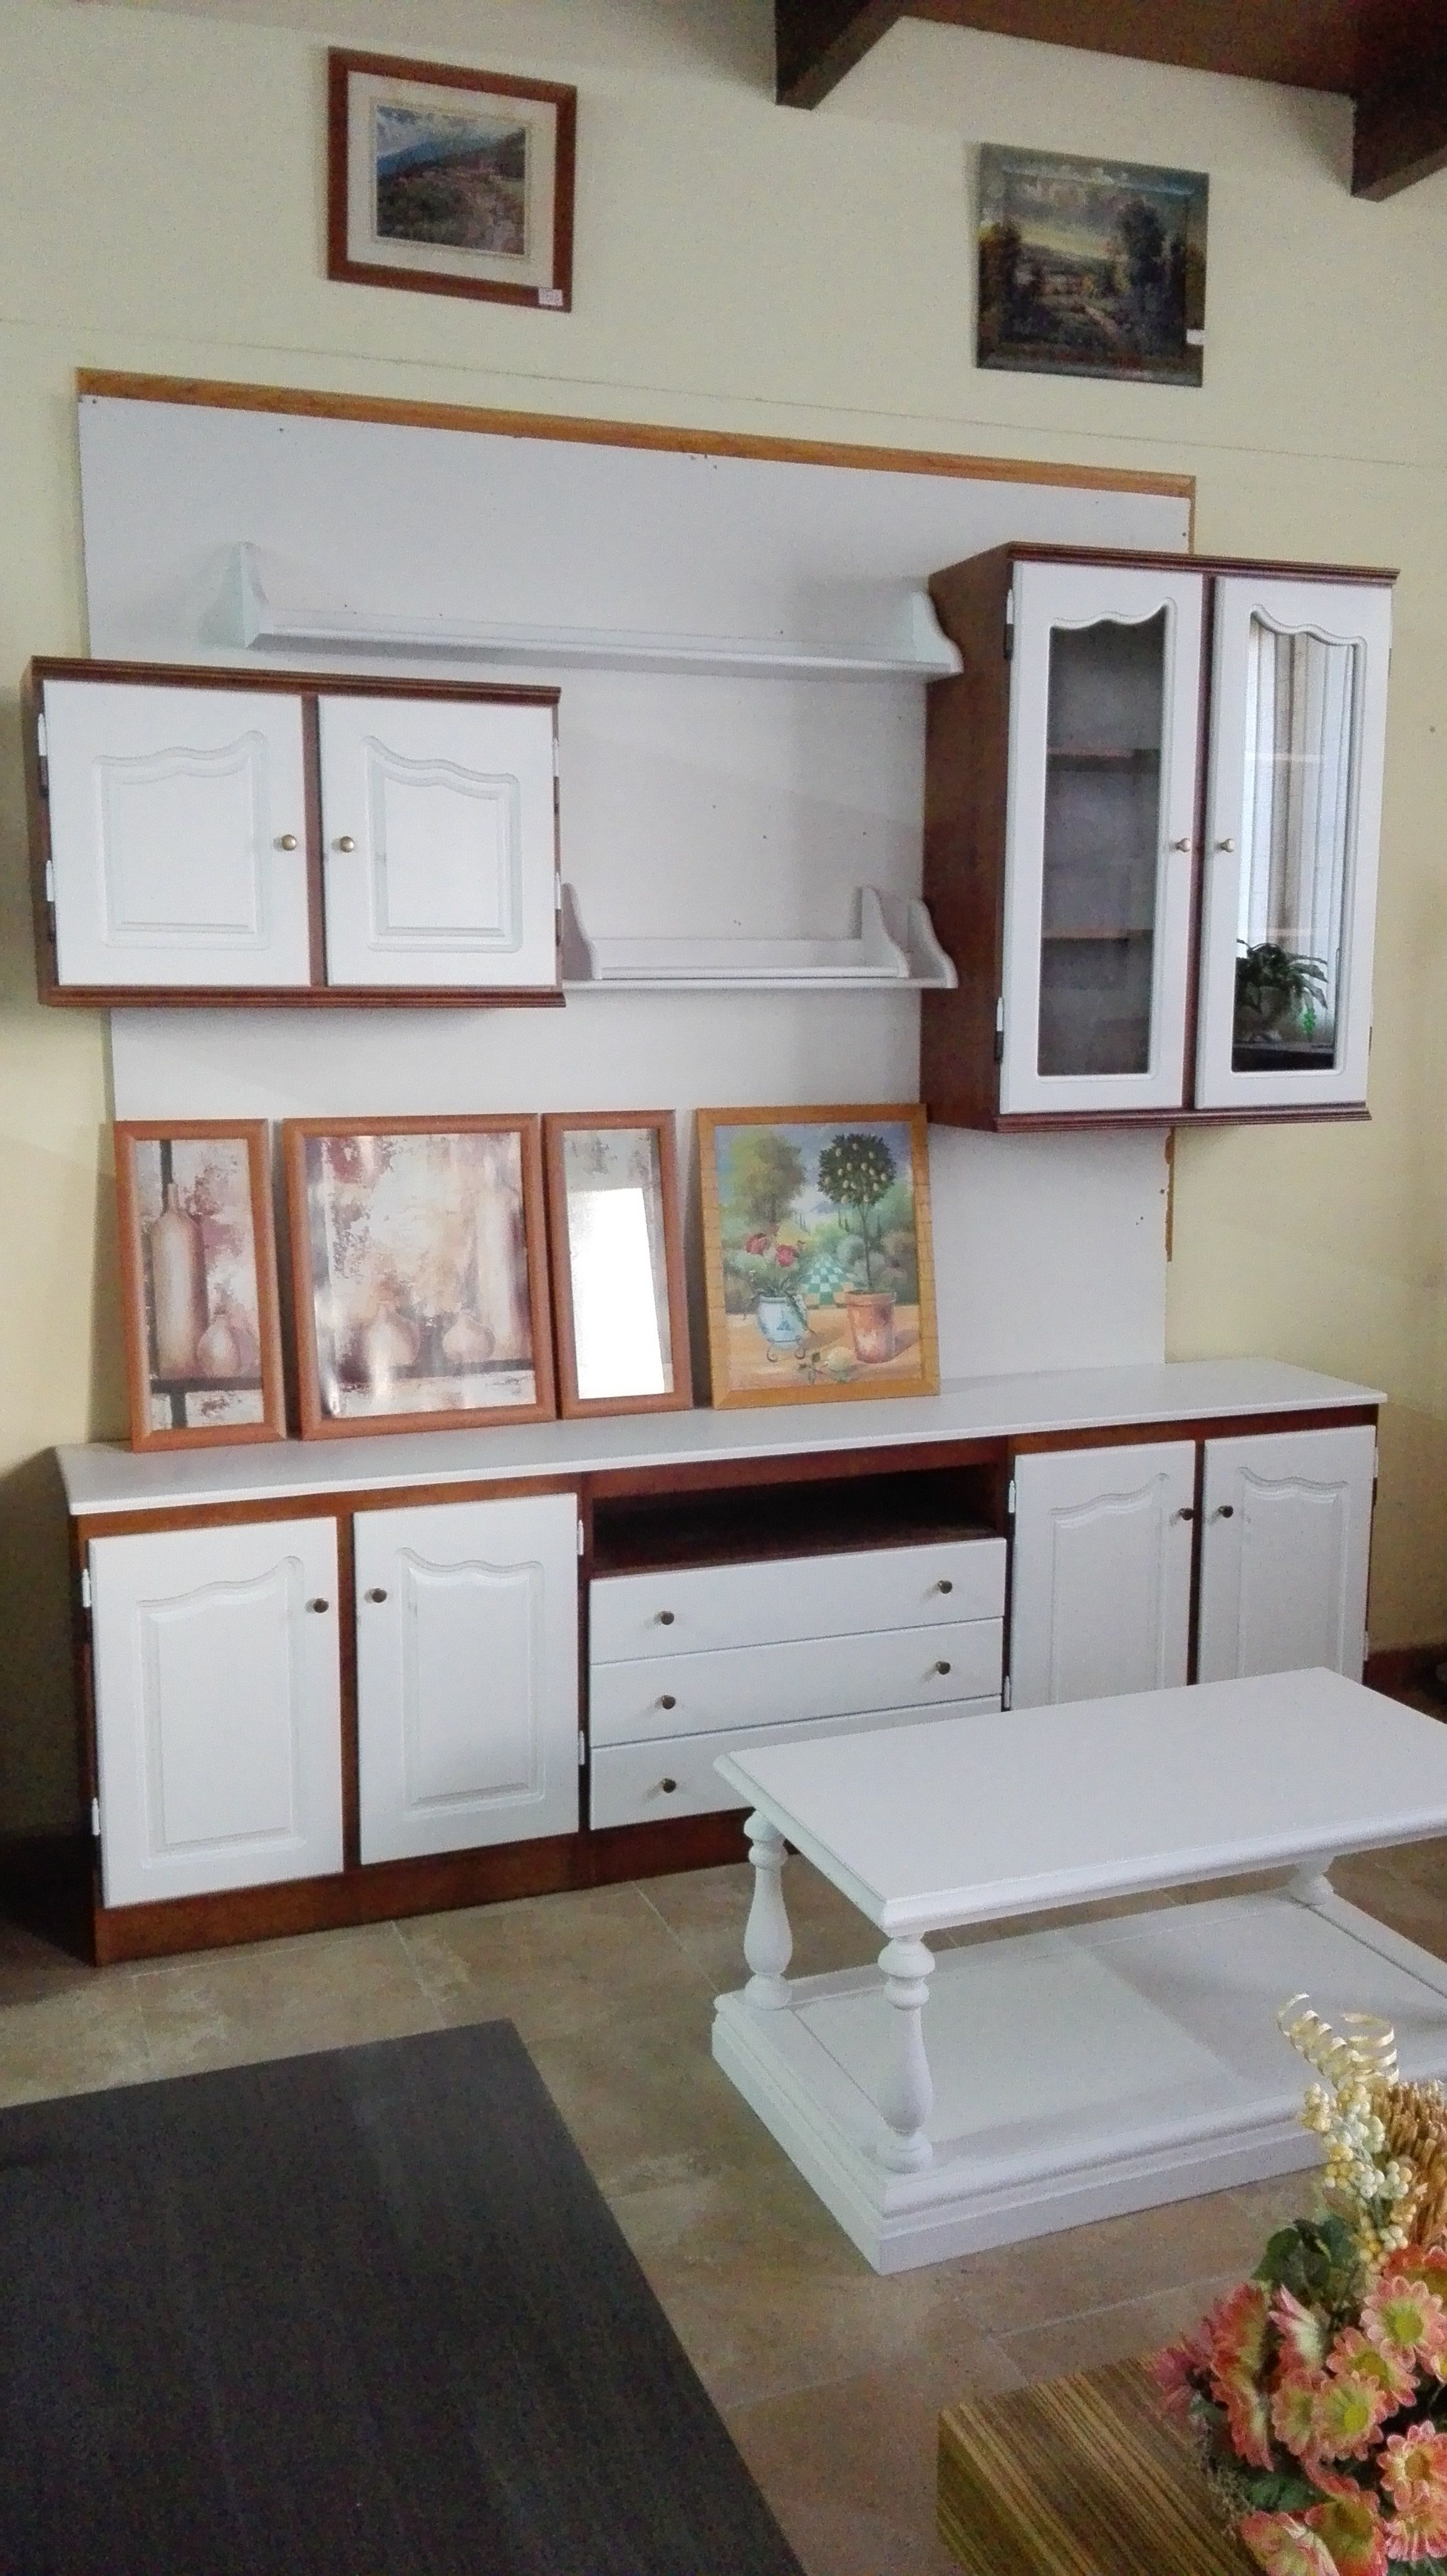 Muebles para sal n comedor modular de madera maciza 240 cm for Salon comedor lacado blanco